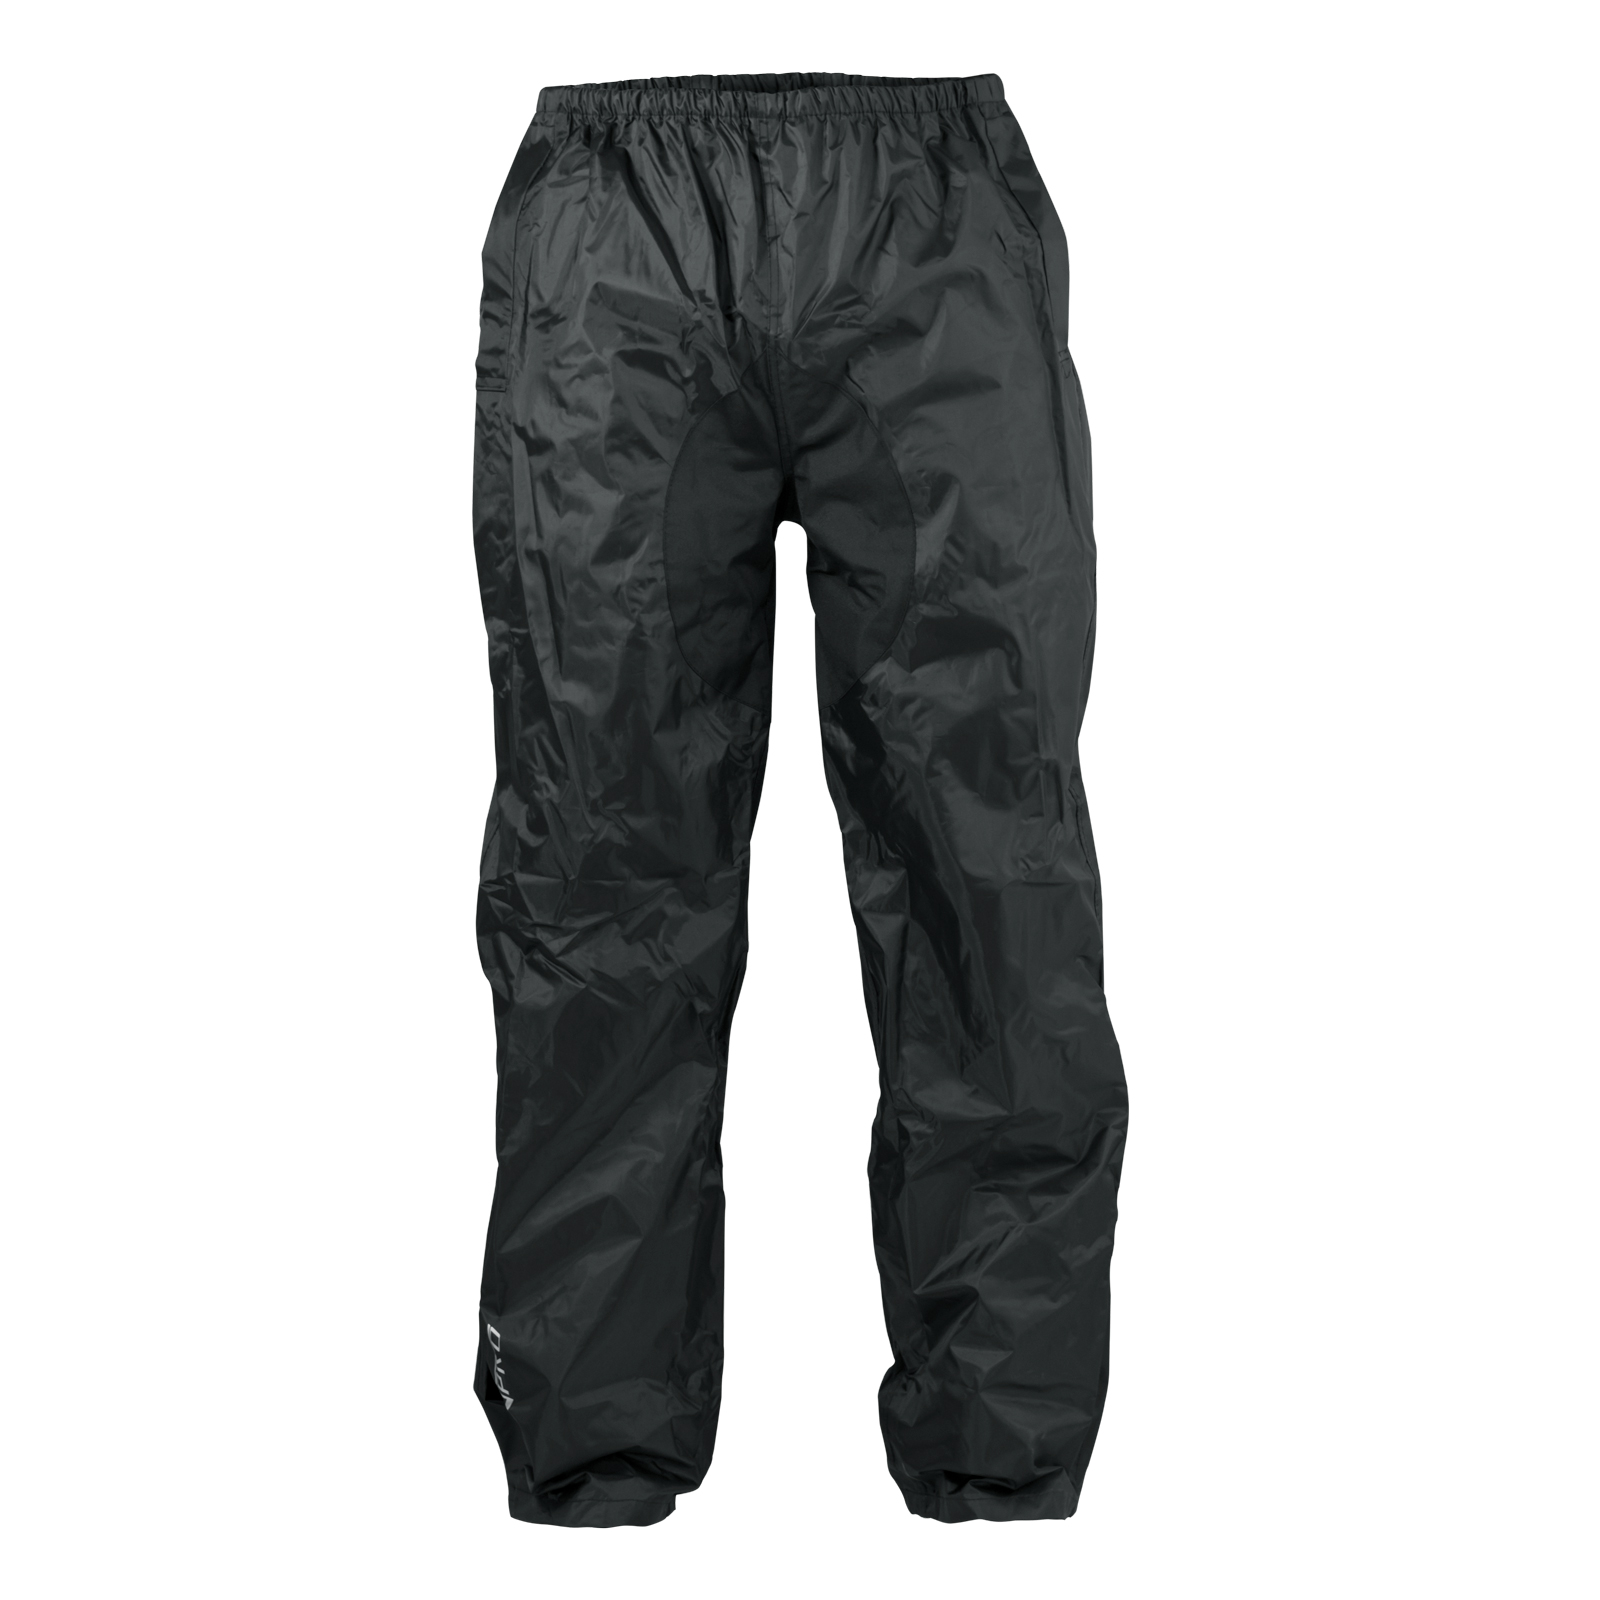 Pantalon-100-Impermeable-Motard-Moto-Unisex-Protection-Pluie-Unisexe miniature 5